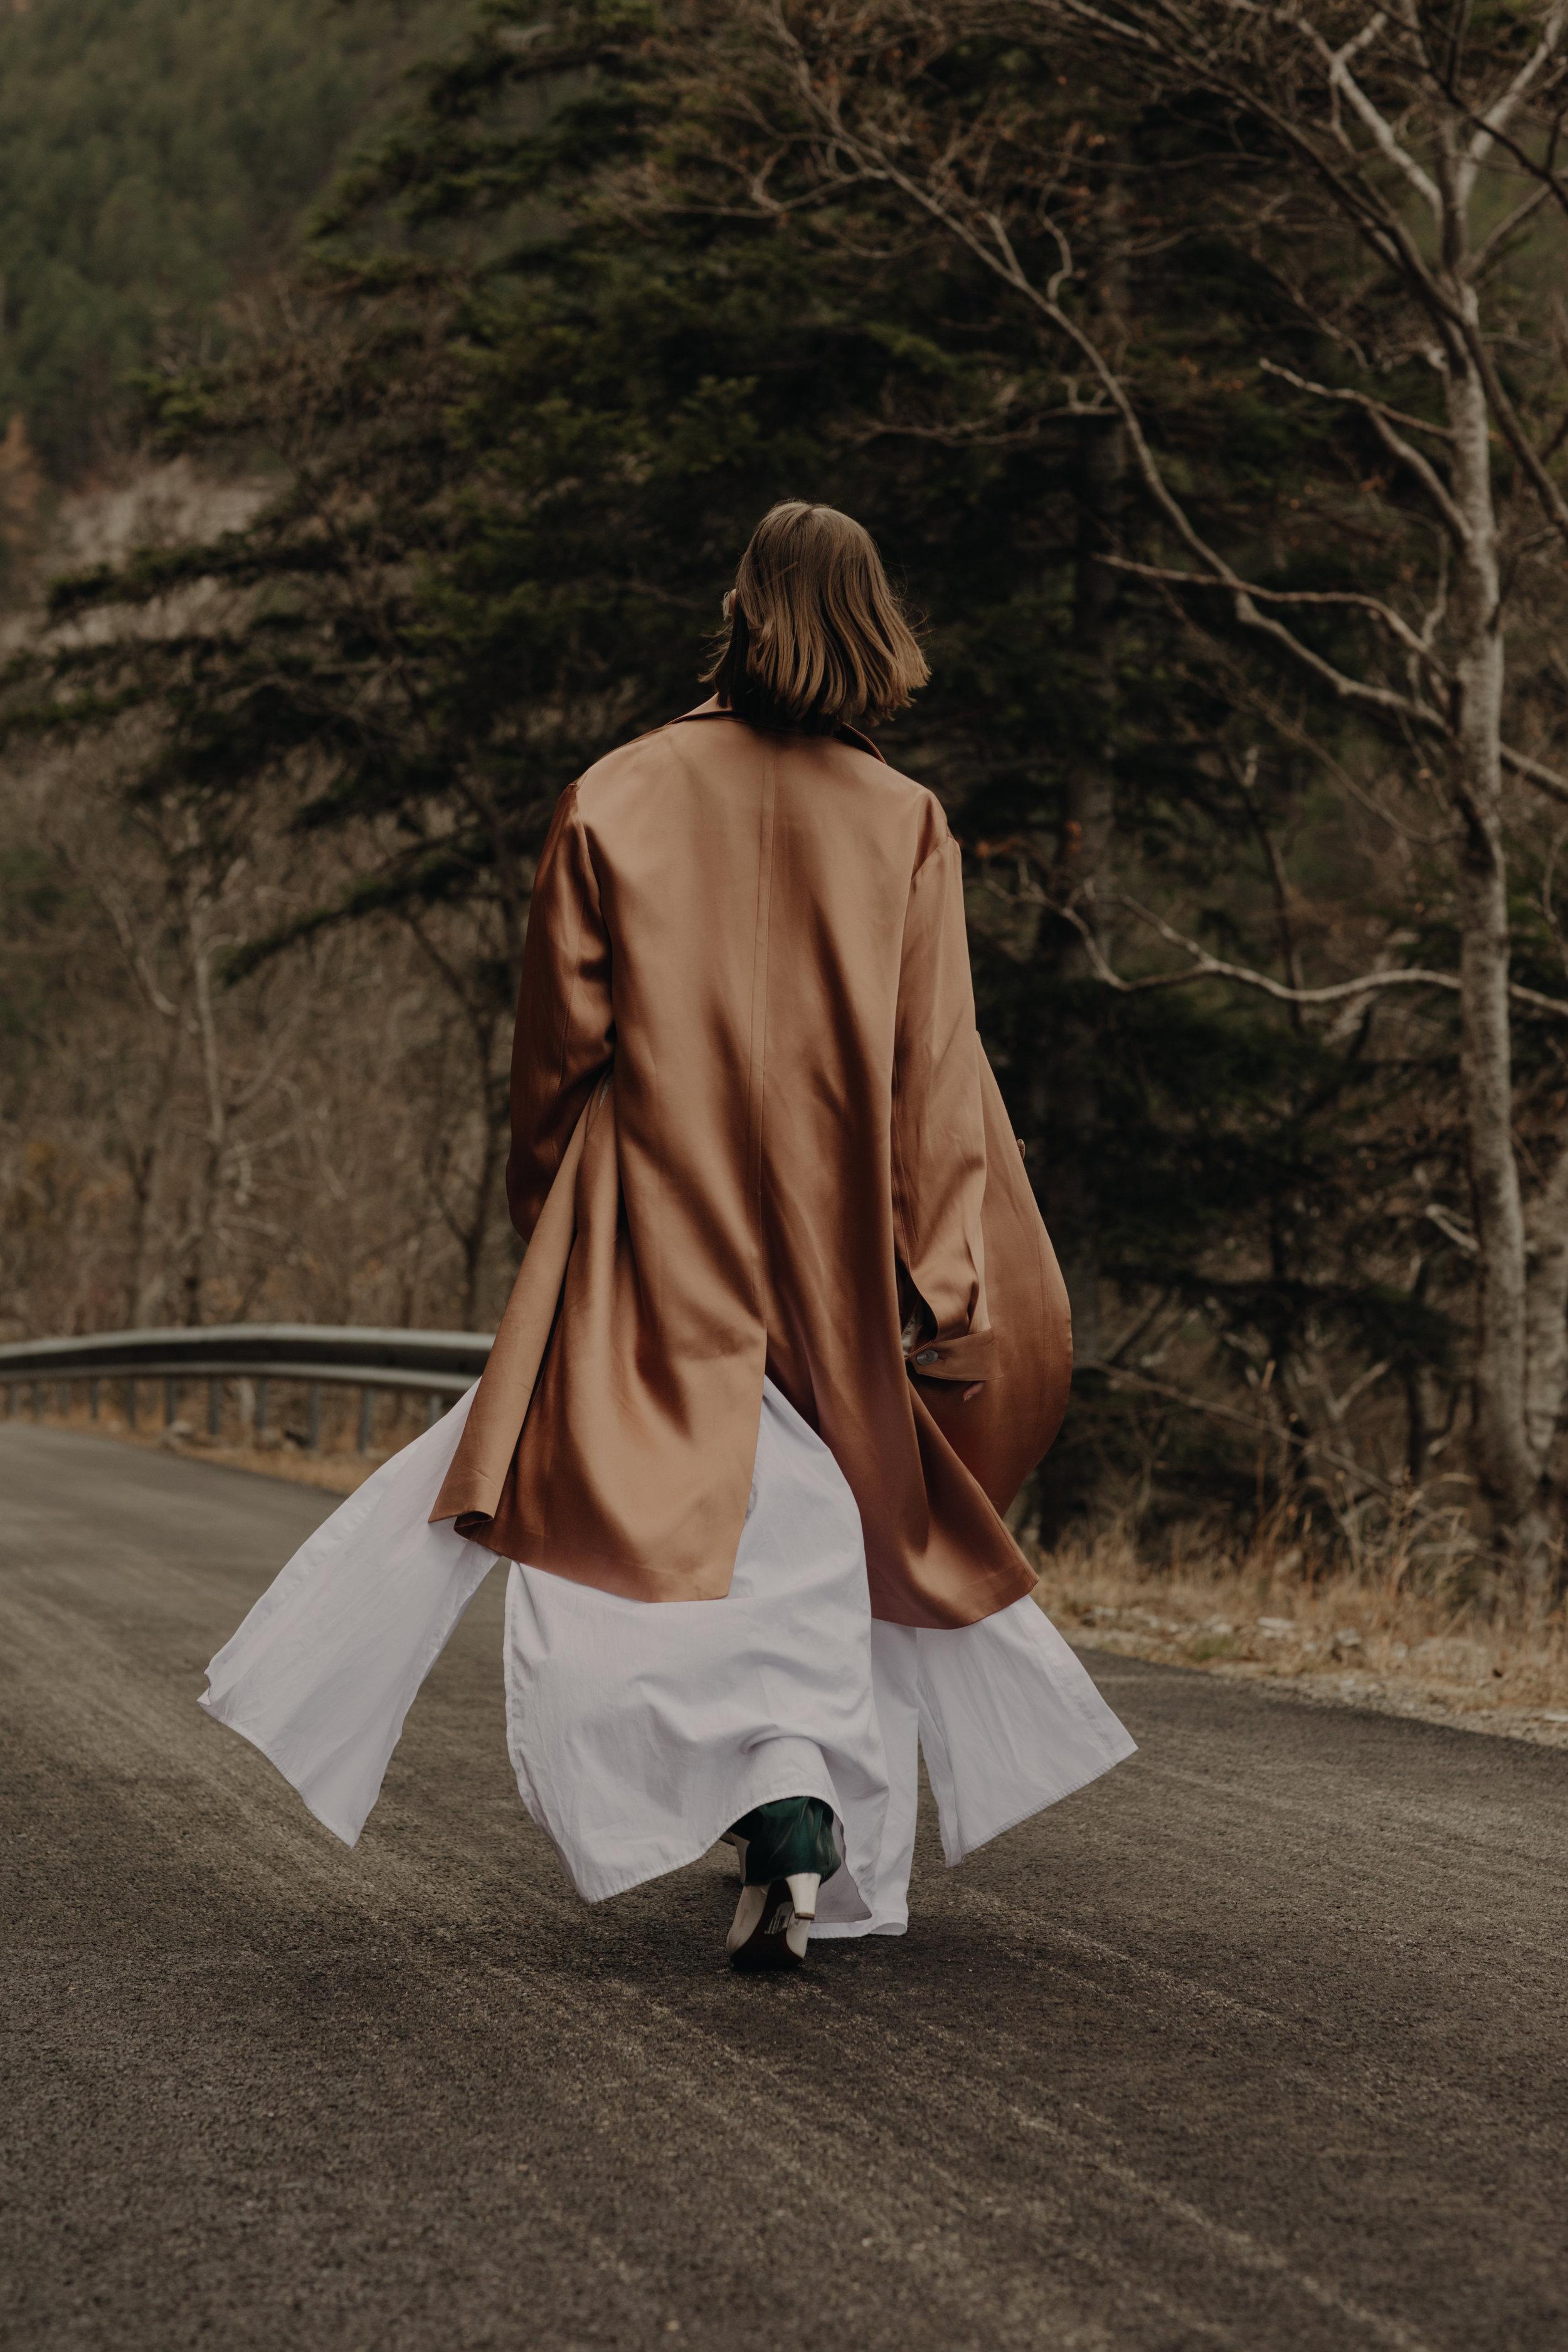 Coat  SEAN SUEN  Under Shirt and Trousers  PIERRE  Long Shirt  NEHERA  Shoes  DAVID BEAUCIEL